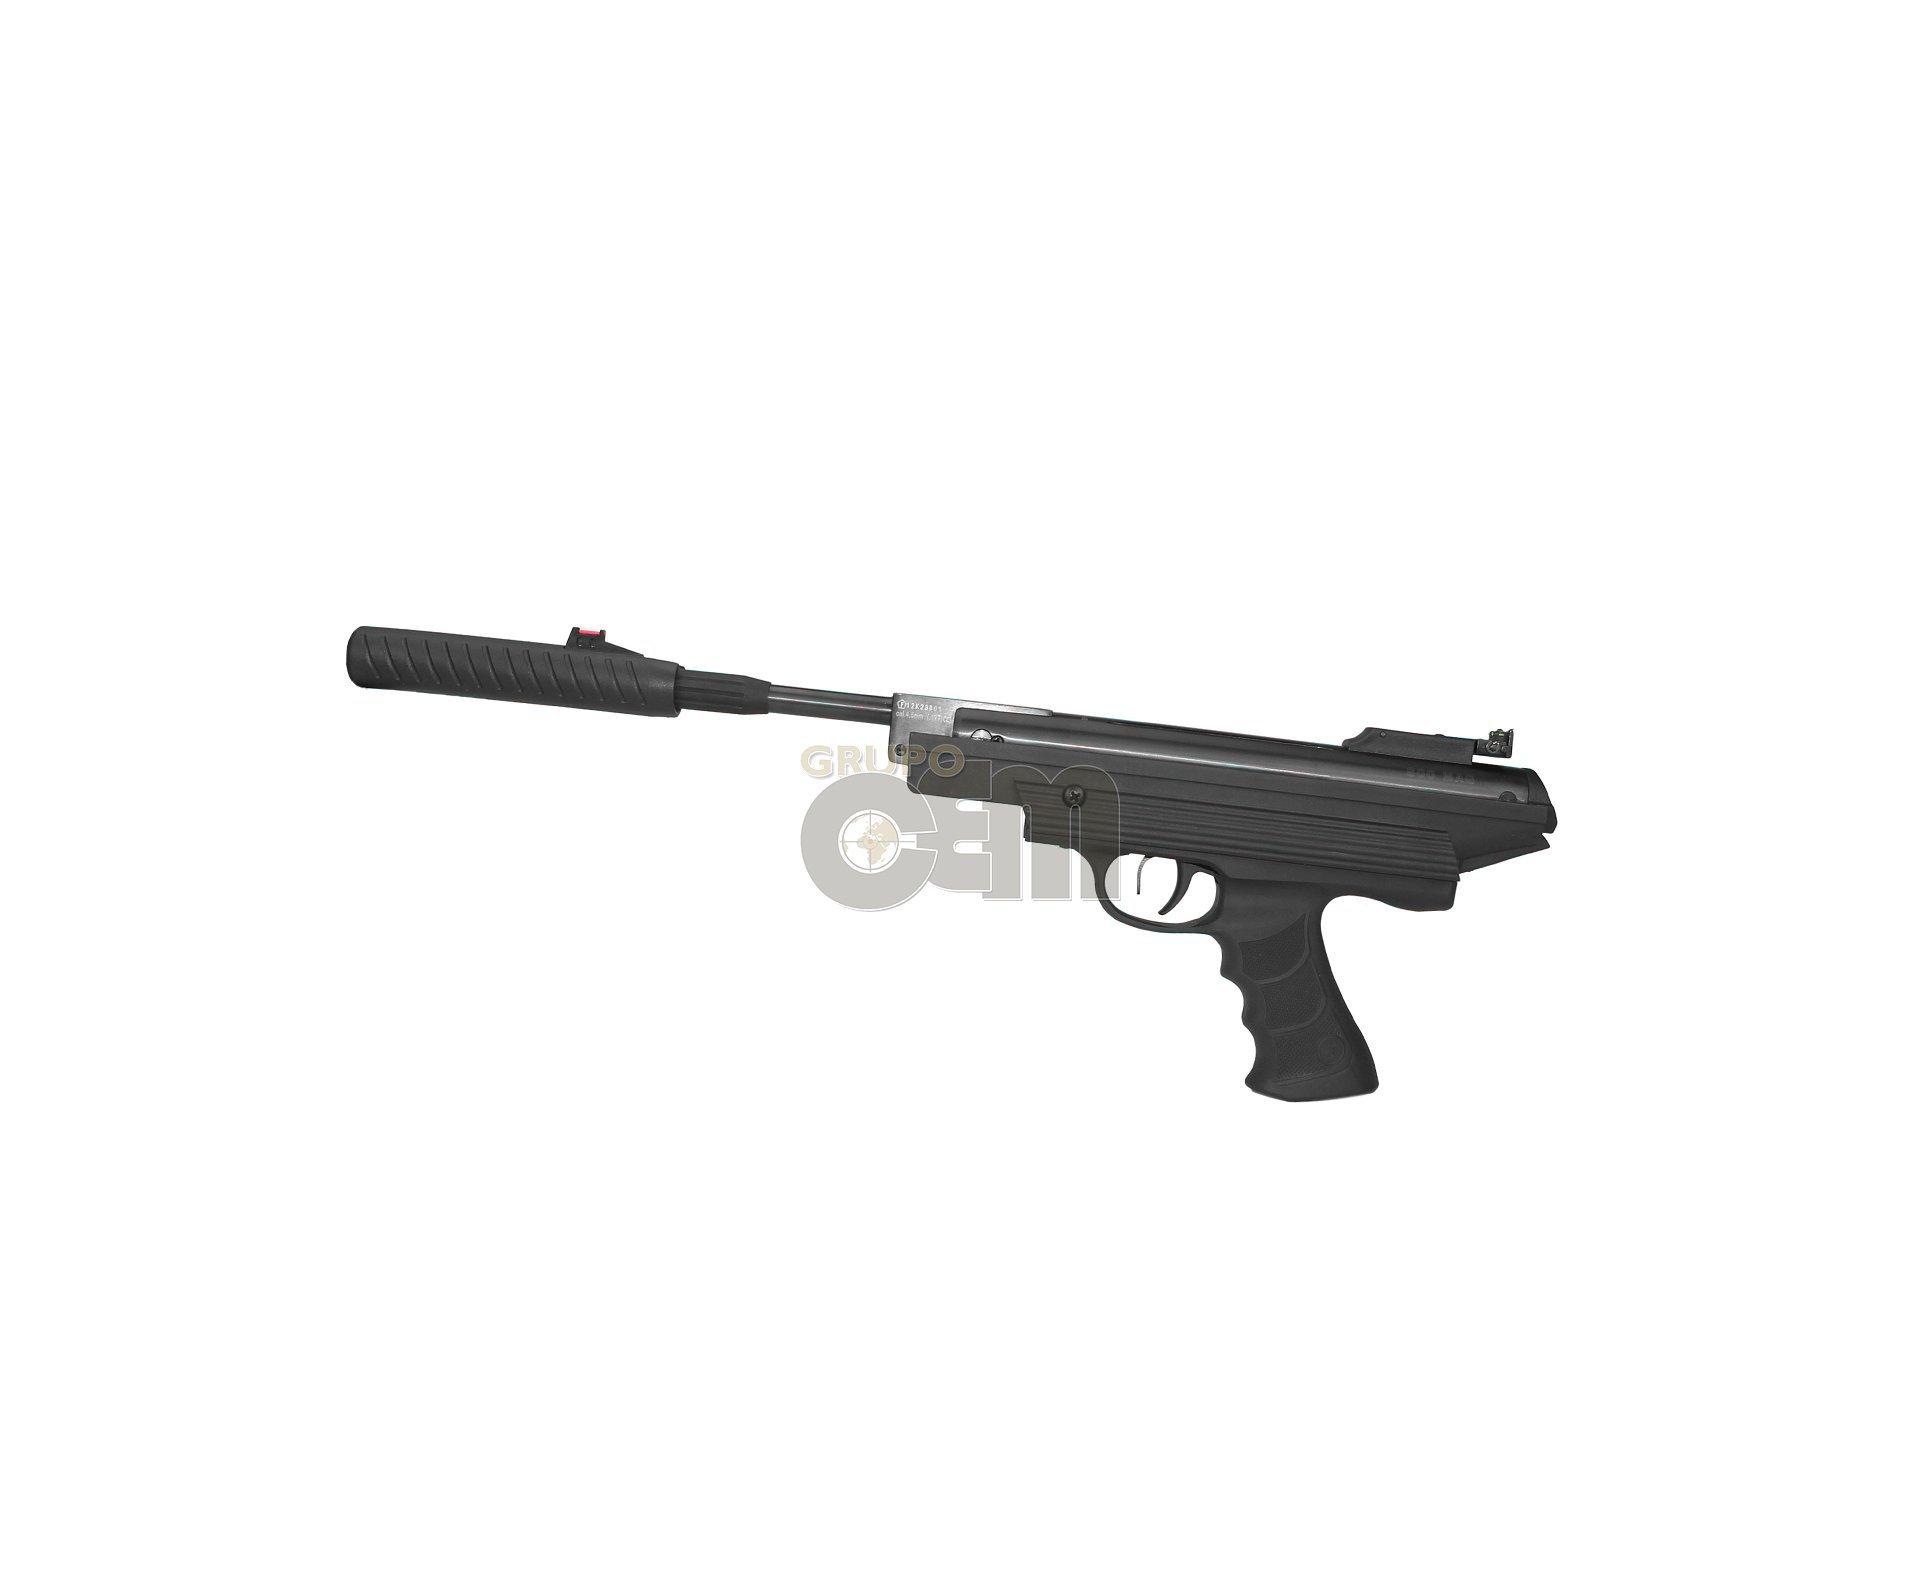 Pistola De Pressão 800 Mag Cal 4,5mm - Browning